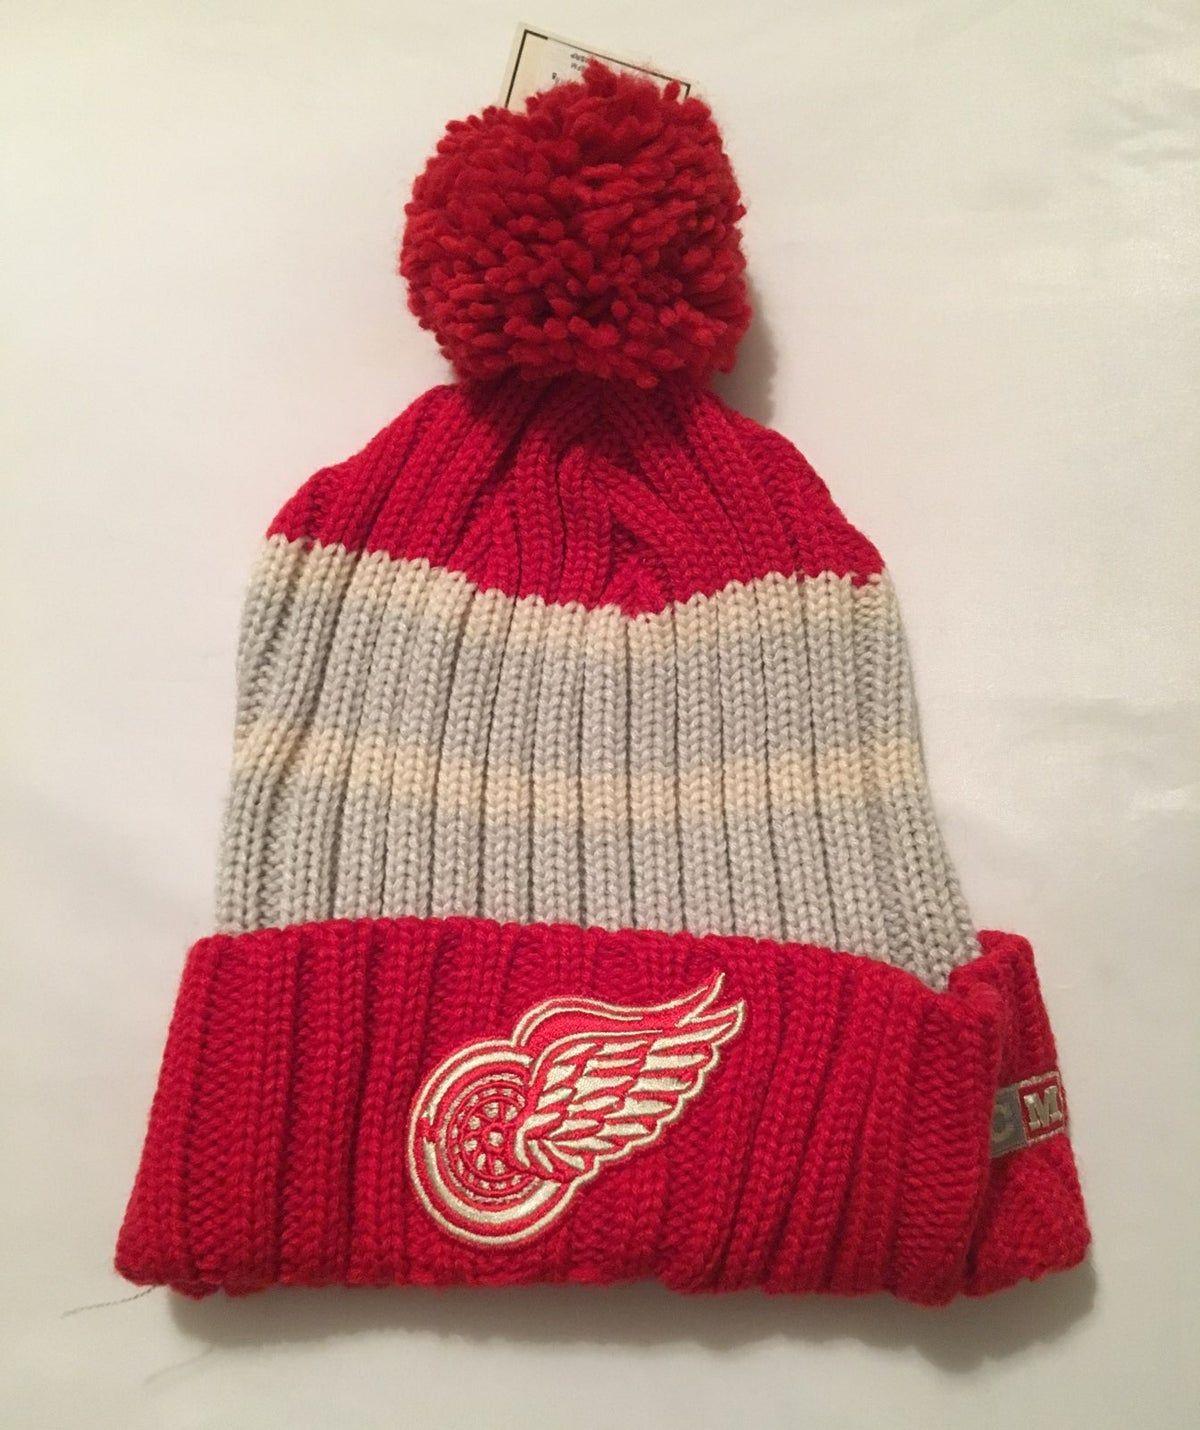 Pin by Irene Heba on Detroit Red Wings | Detroit red wings ...